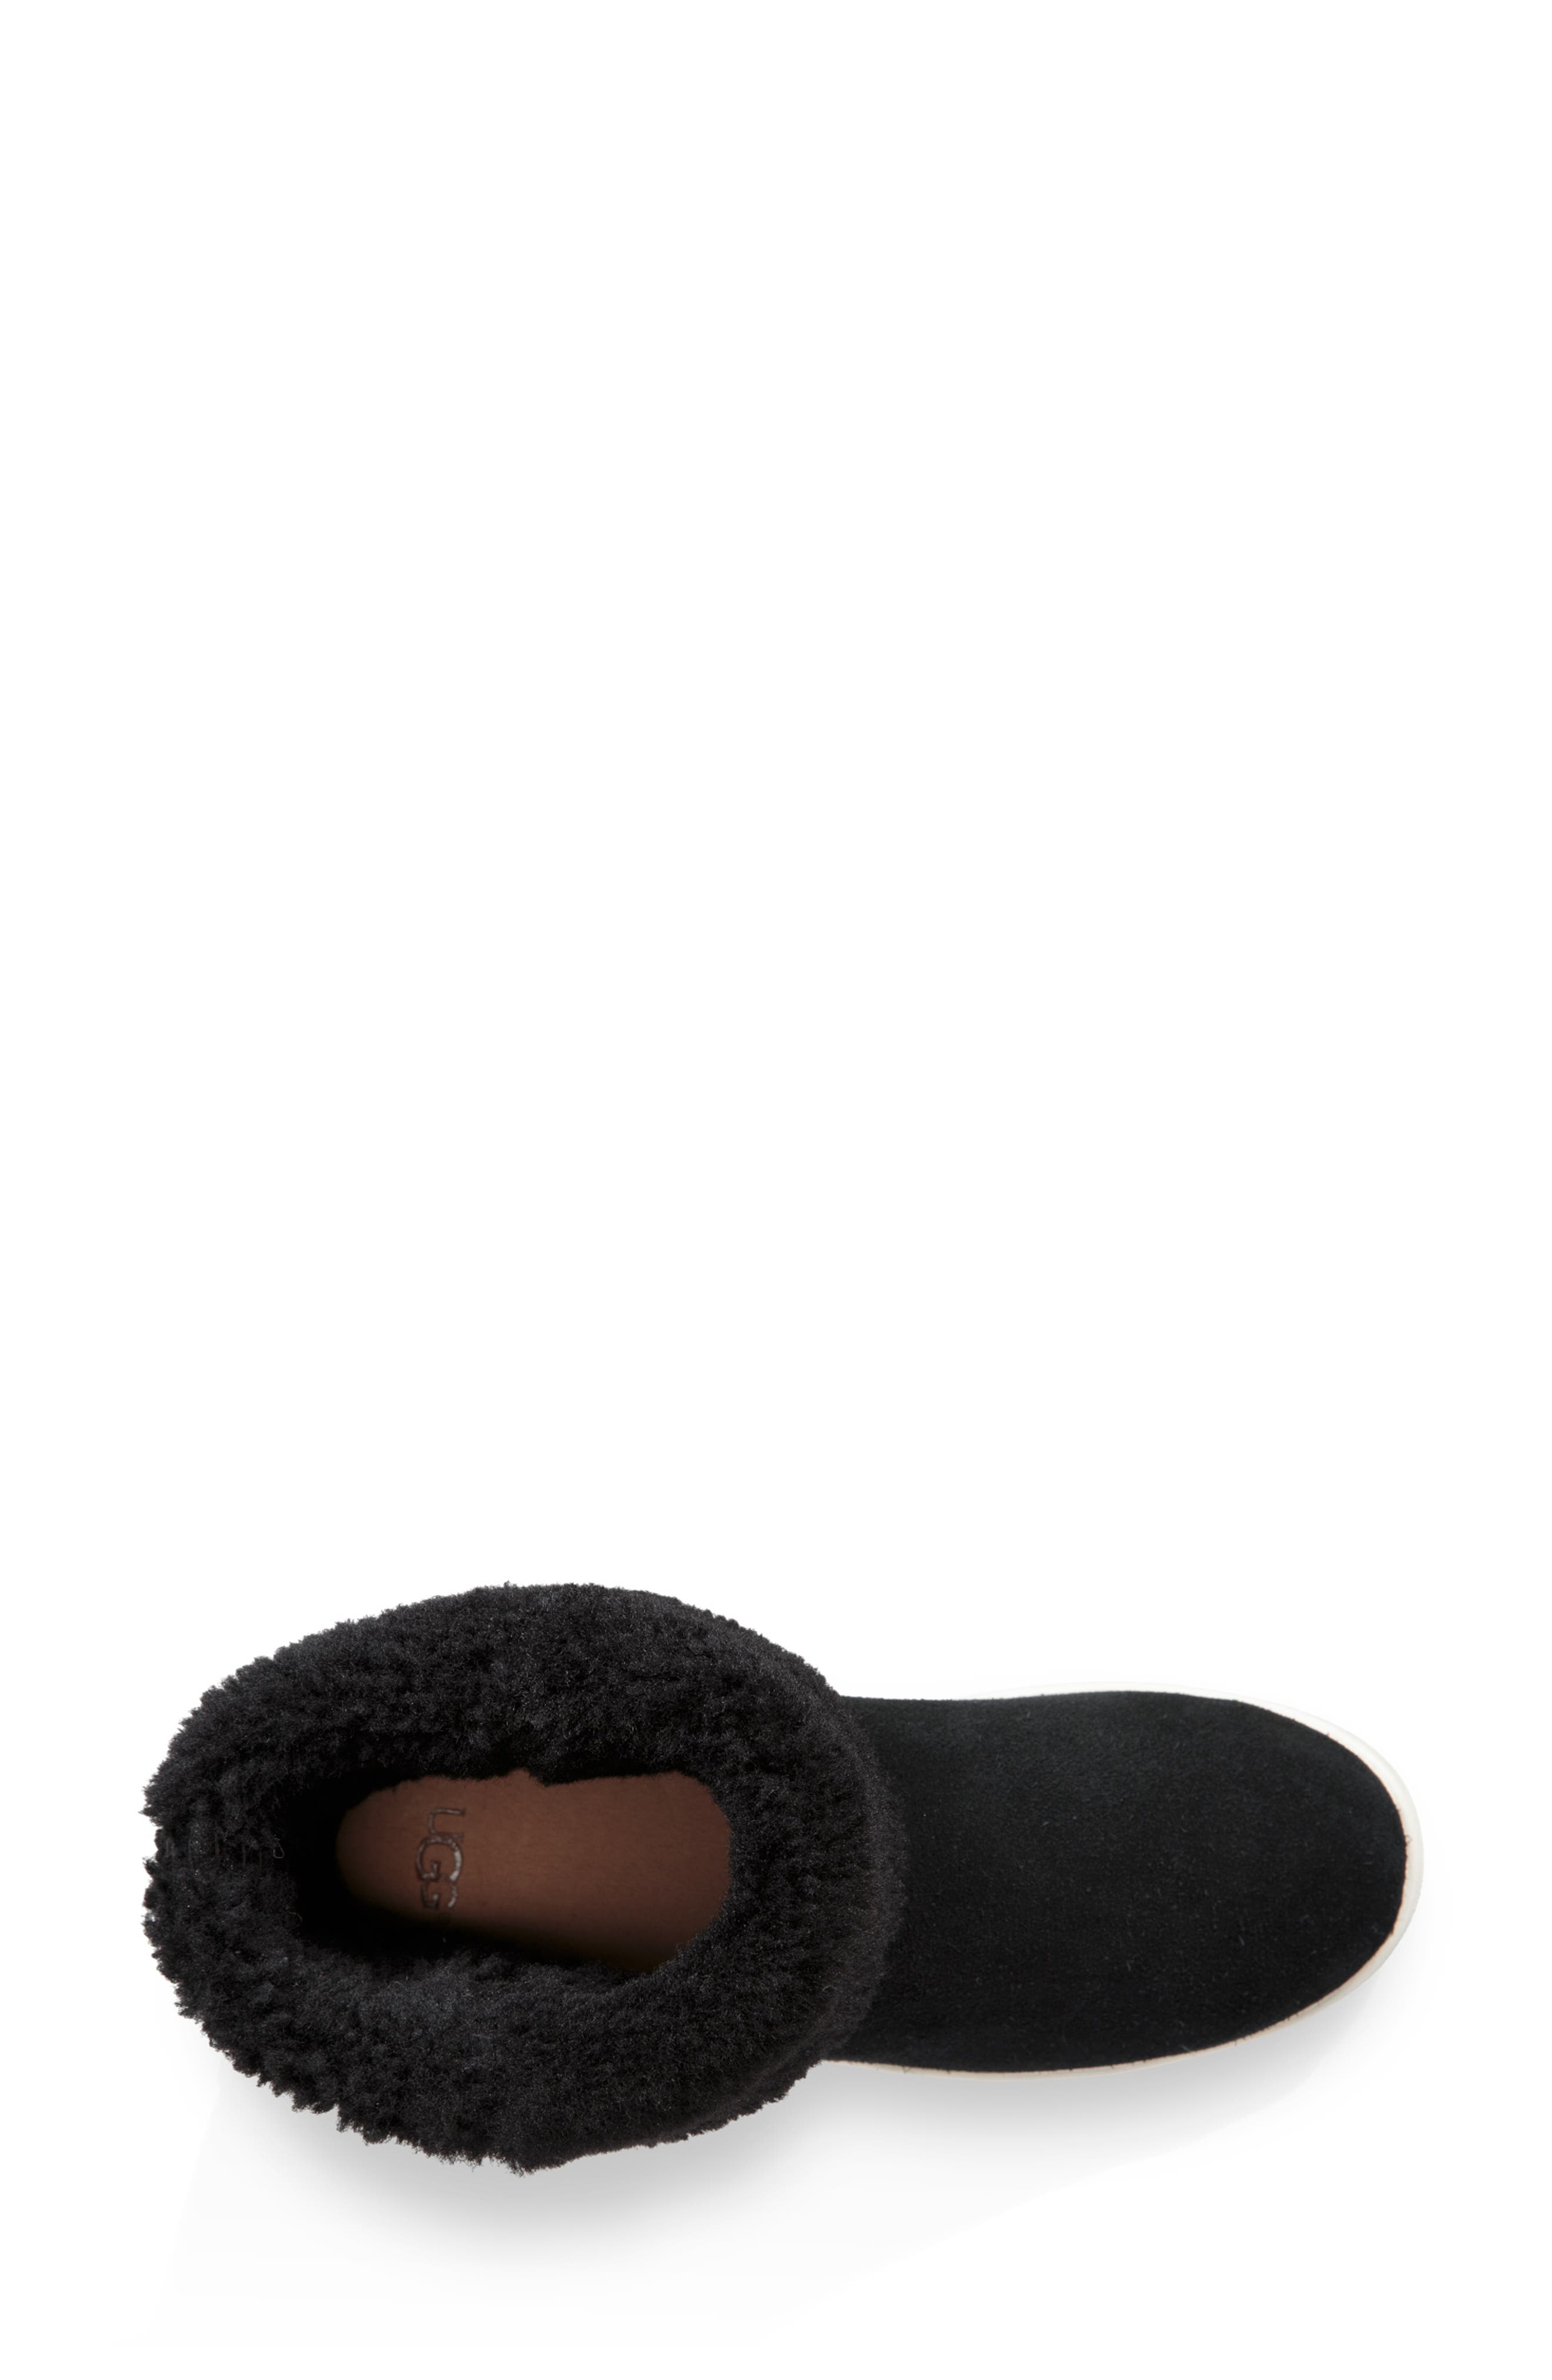 Mika Classic Genuine Shearling Sneaker,                             Alternate thumbnail 5, color,                             BLACK